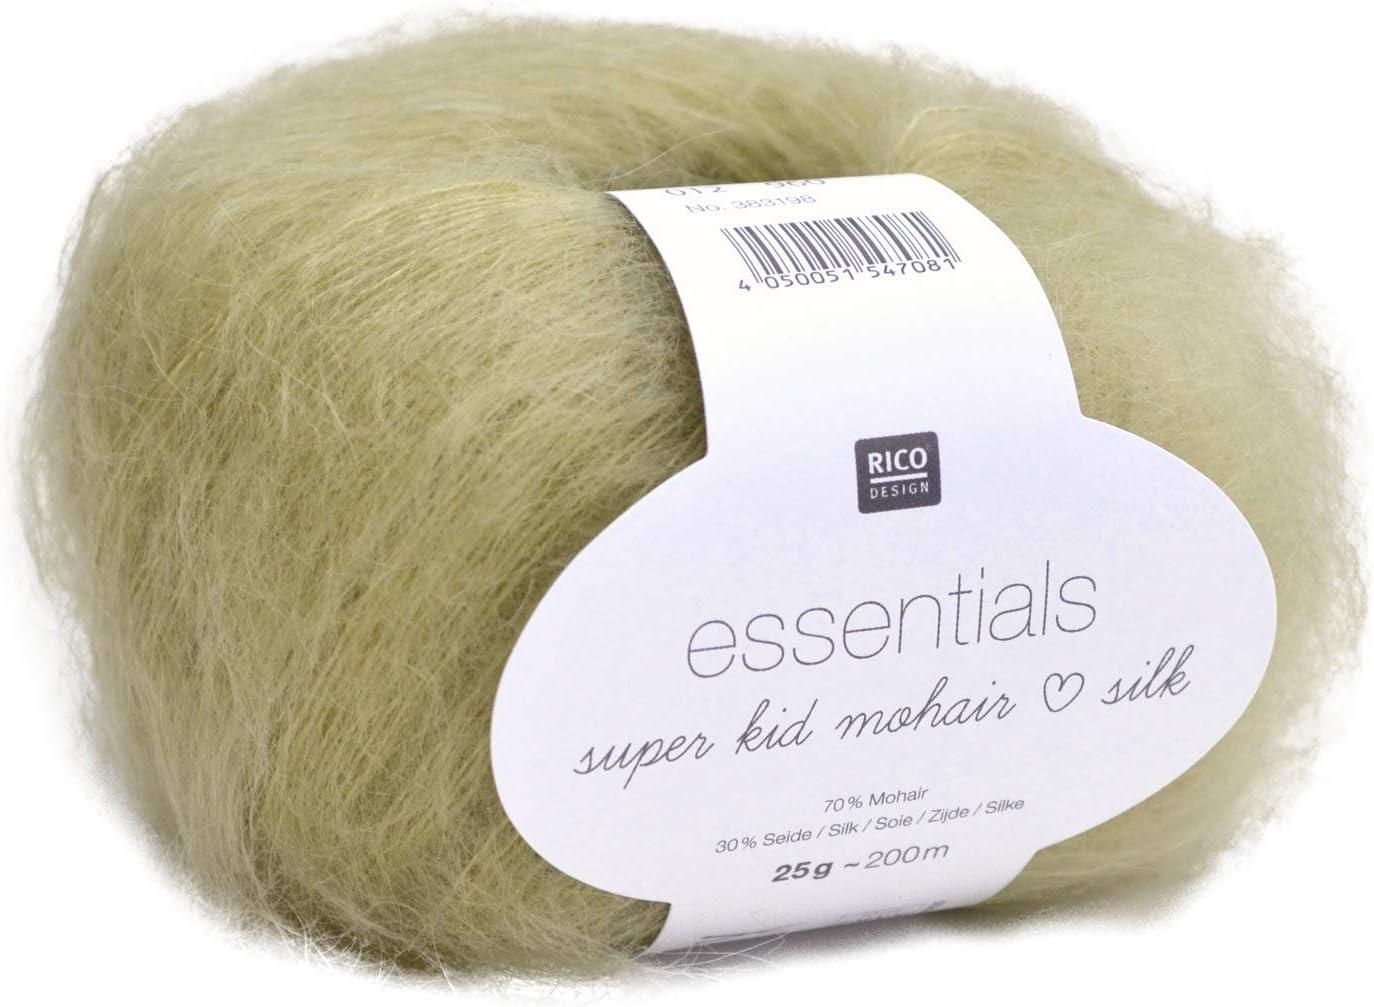 Farbe 008 Silber Rico Design Essentials Super Kid Mohair Silk Fil 25/g/-/Lace pour lingettes Fine